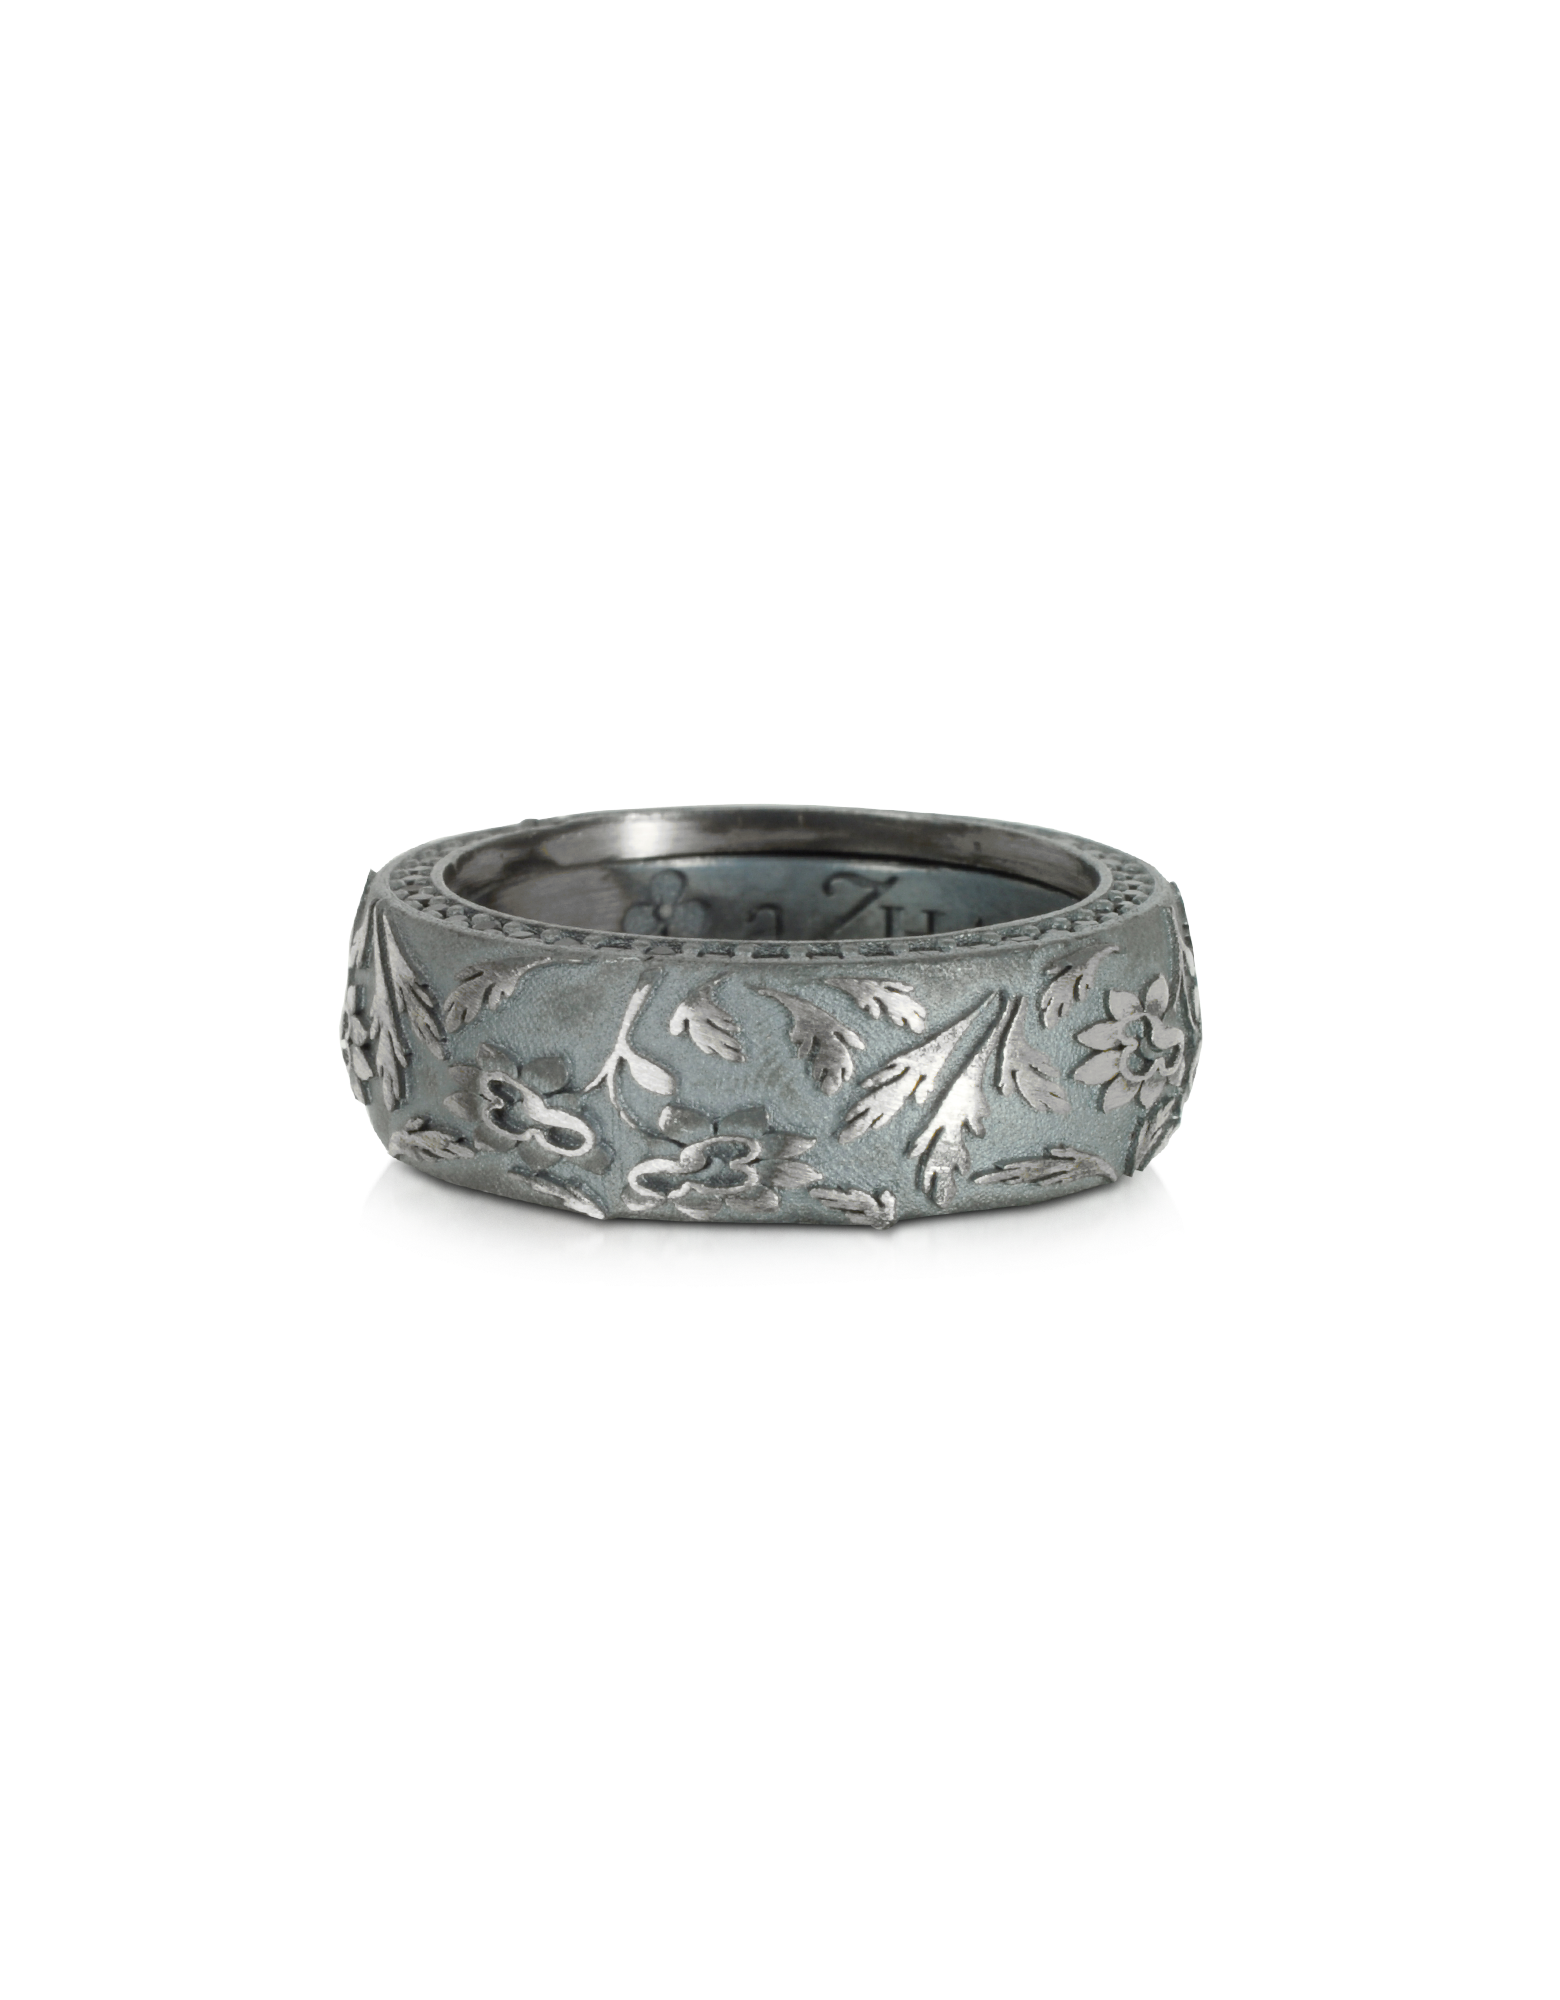 Image of Bassorilievo Silver and Zircon Men's Ring